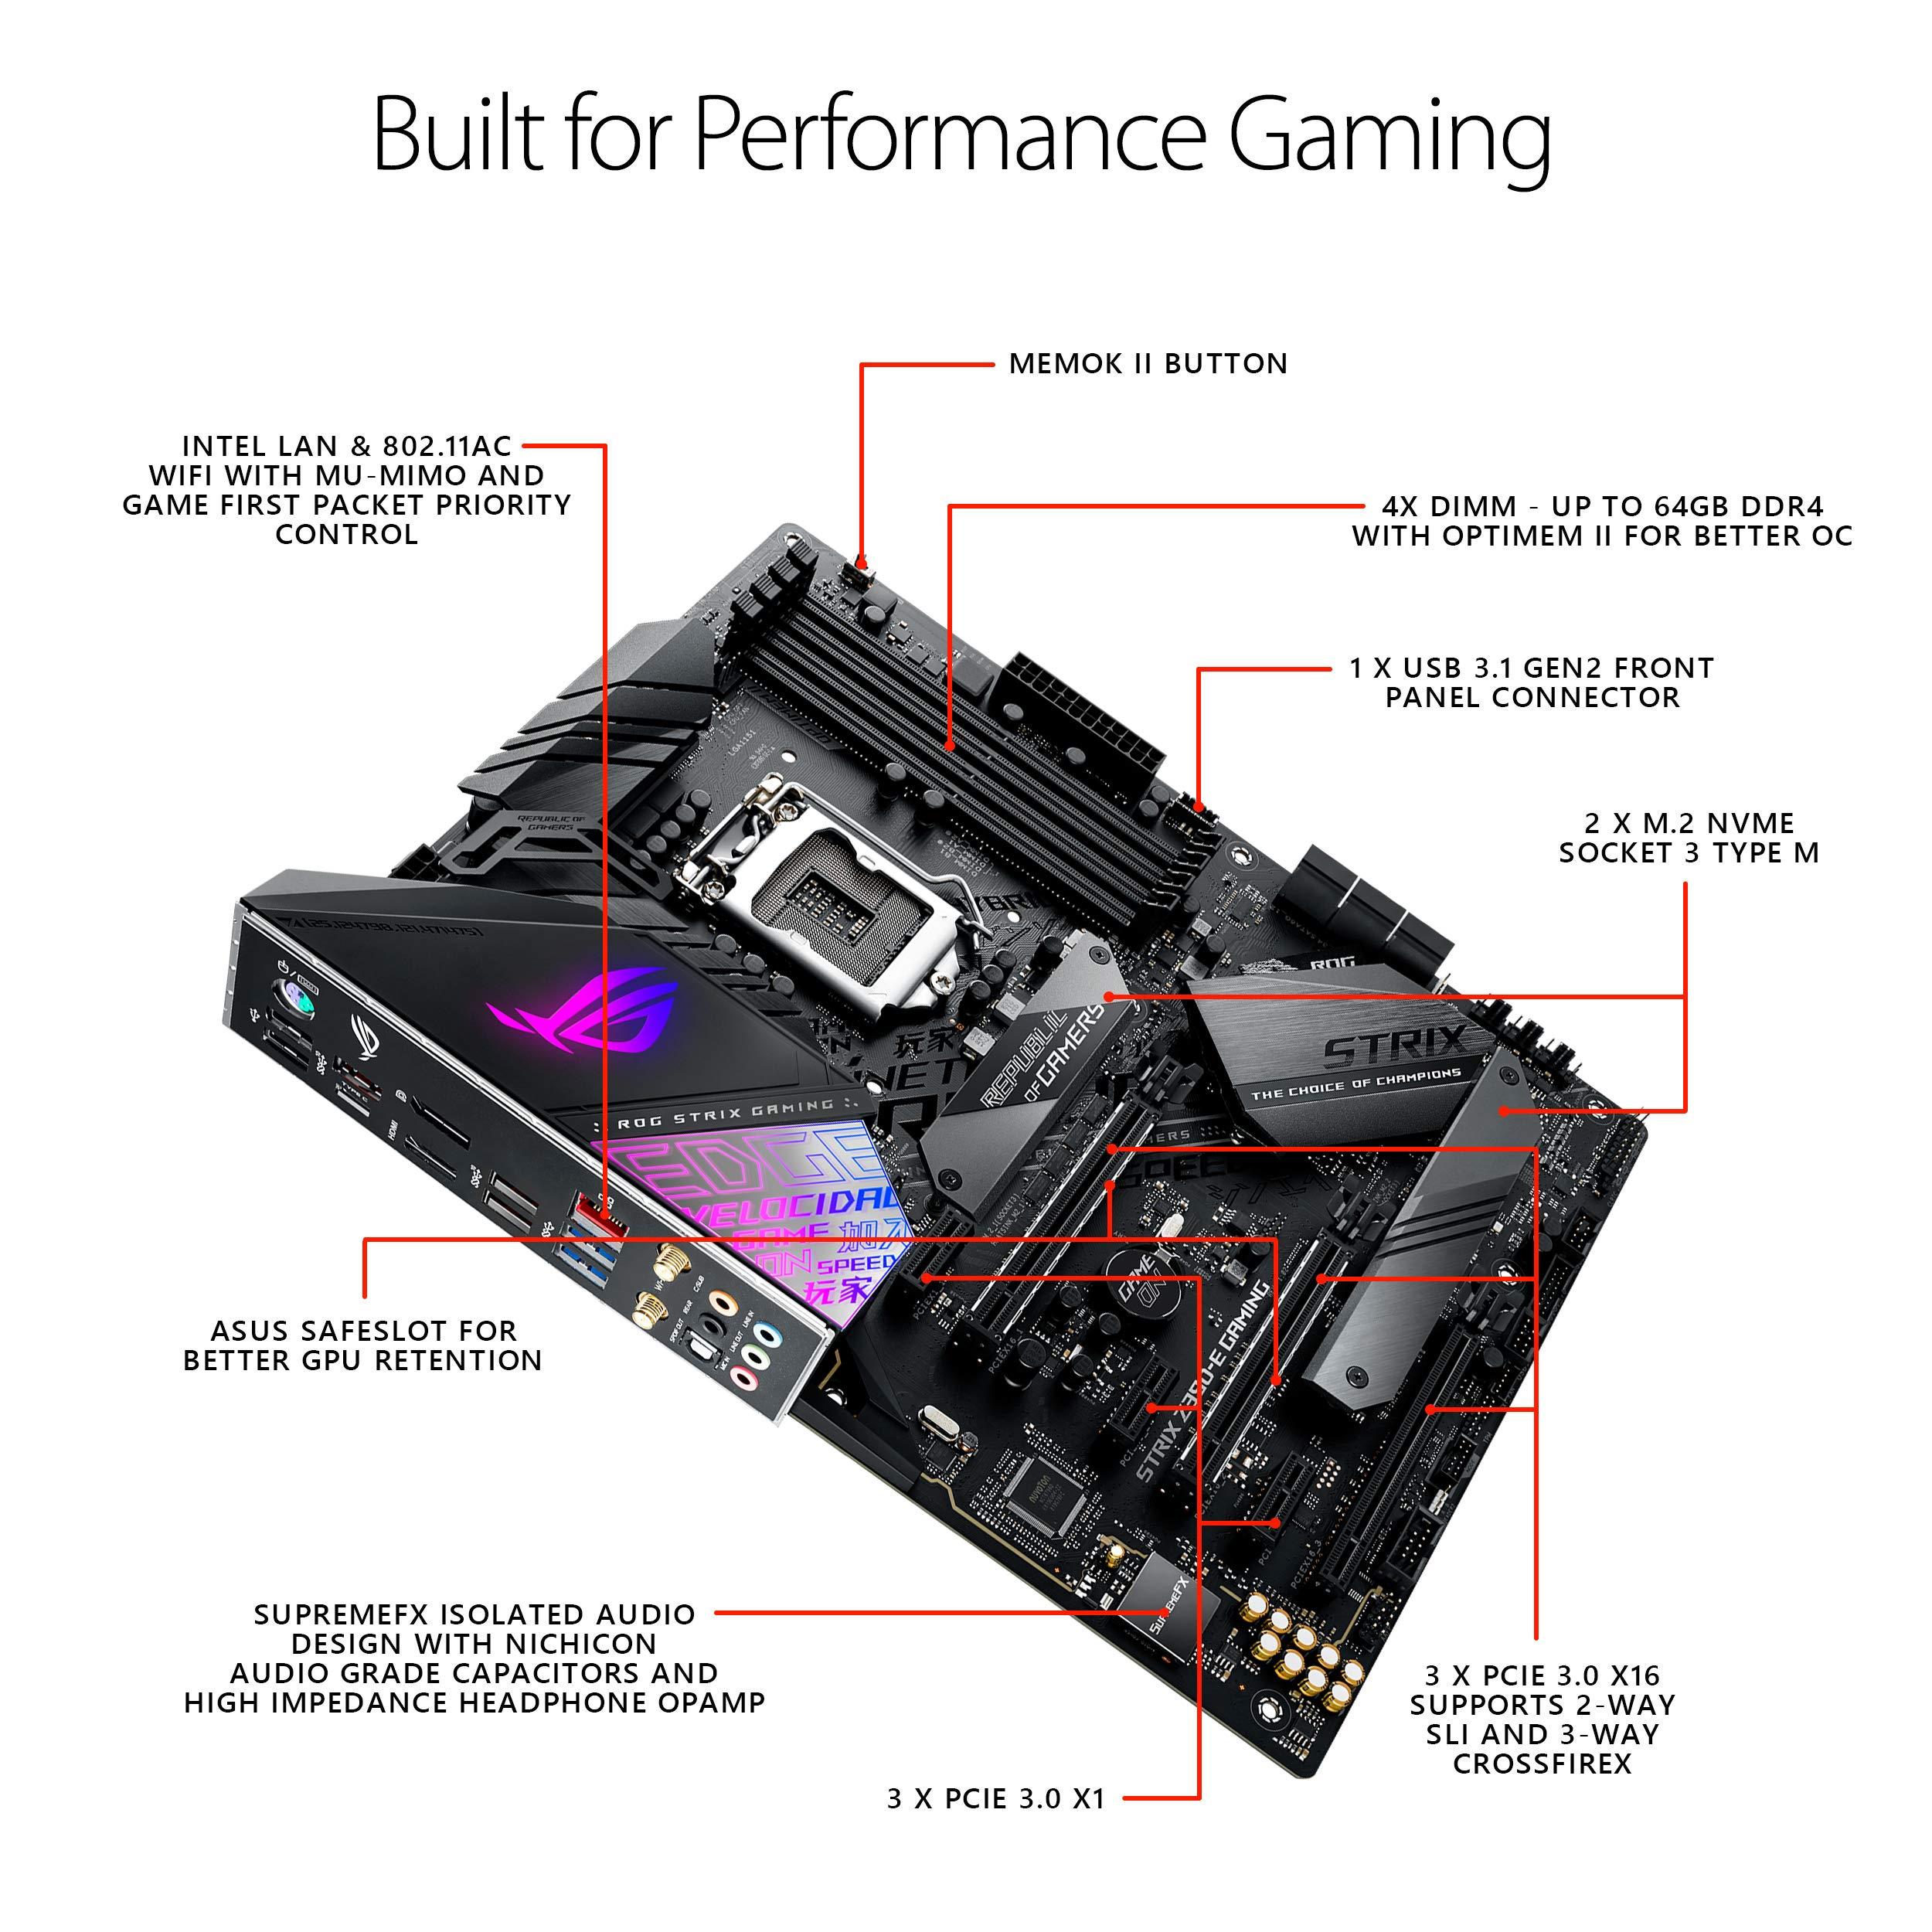 Asus Rog Strix Z390 E Gaming Motherboard Lga1151 Intel 8th 9th Gen Atx Ddr4 Dp Hdmi M 2 Usb 3 1 Gen2 802 11ac Wi Fi Amazon Sg Electronics